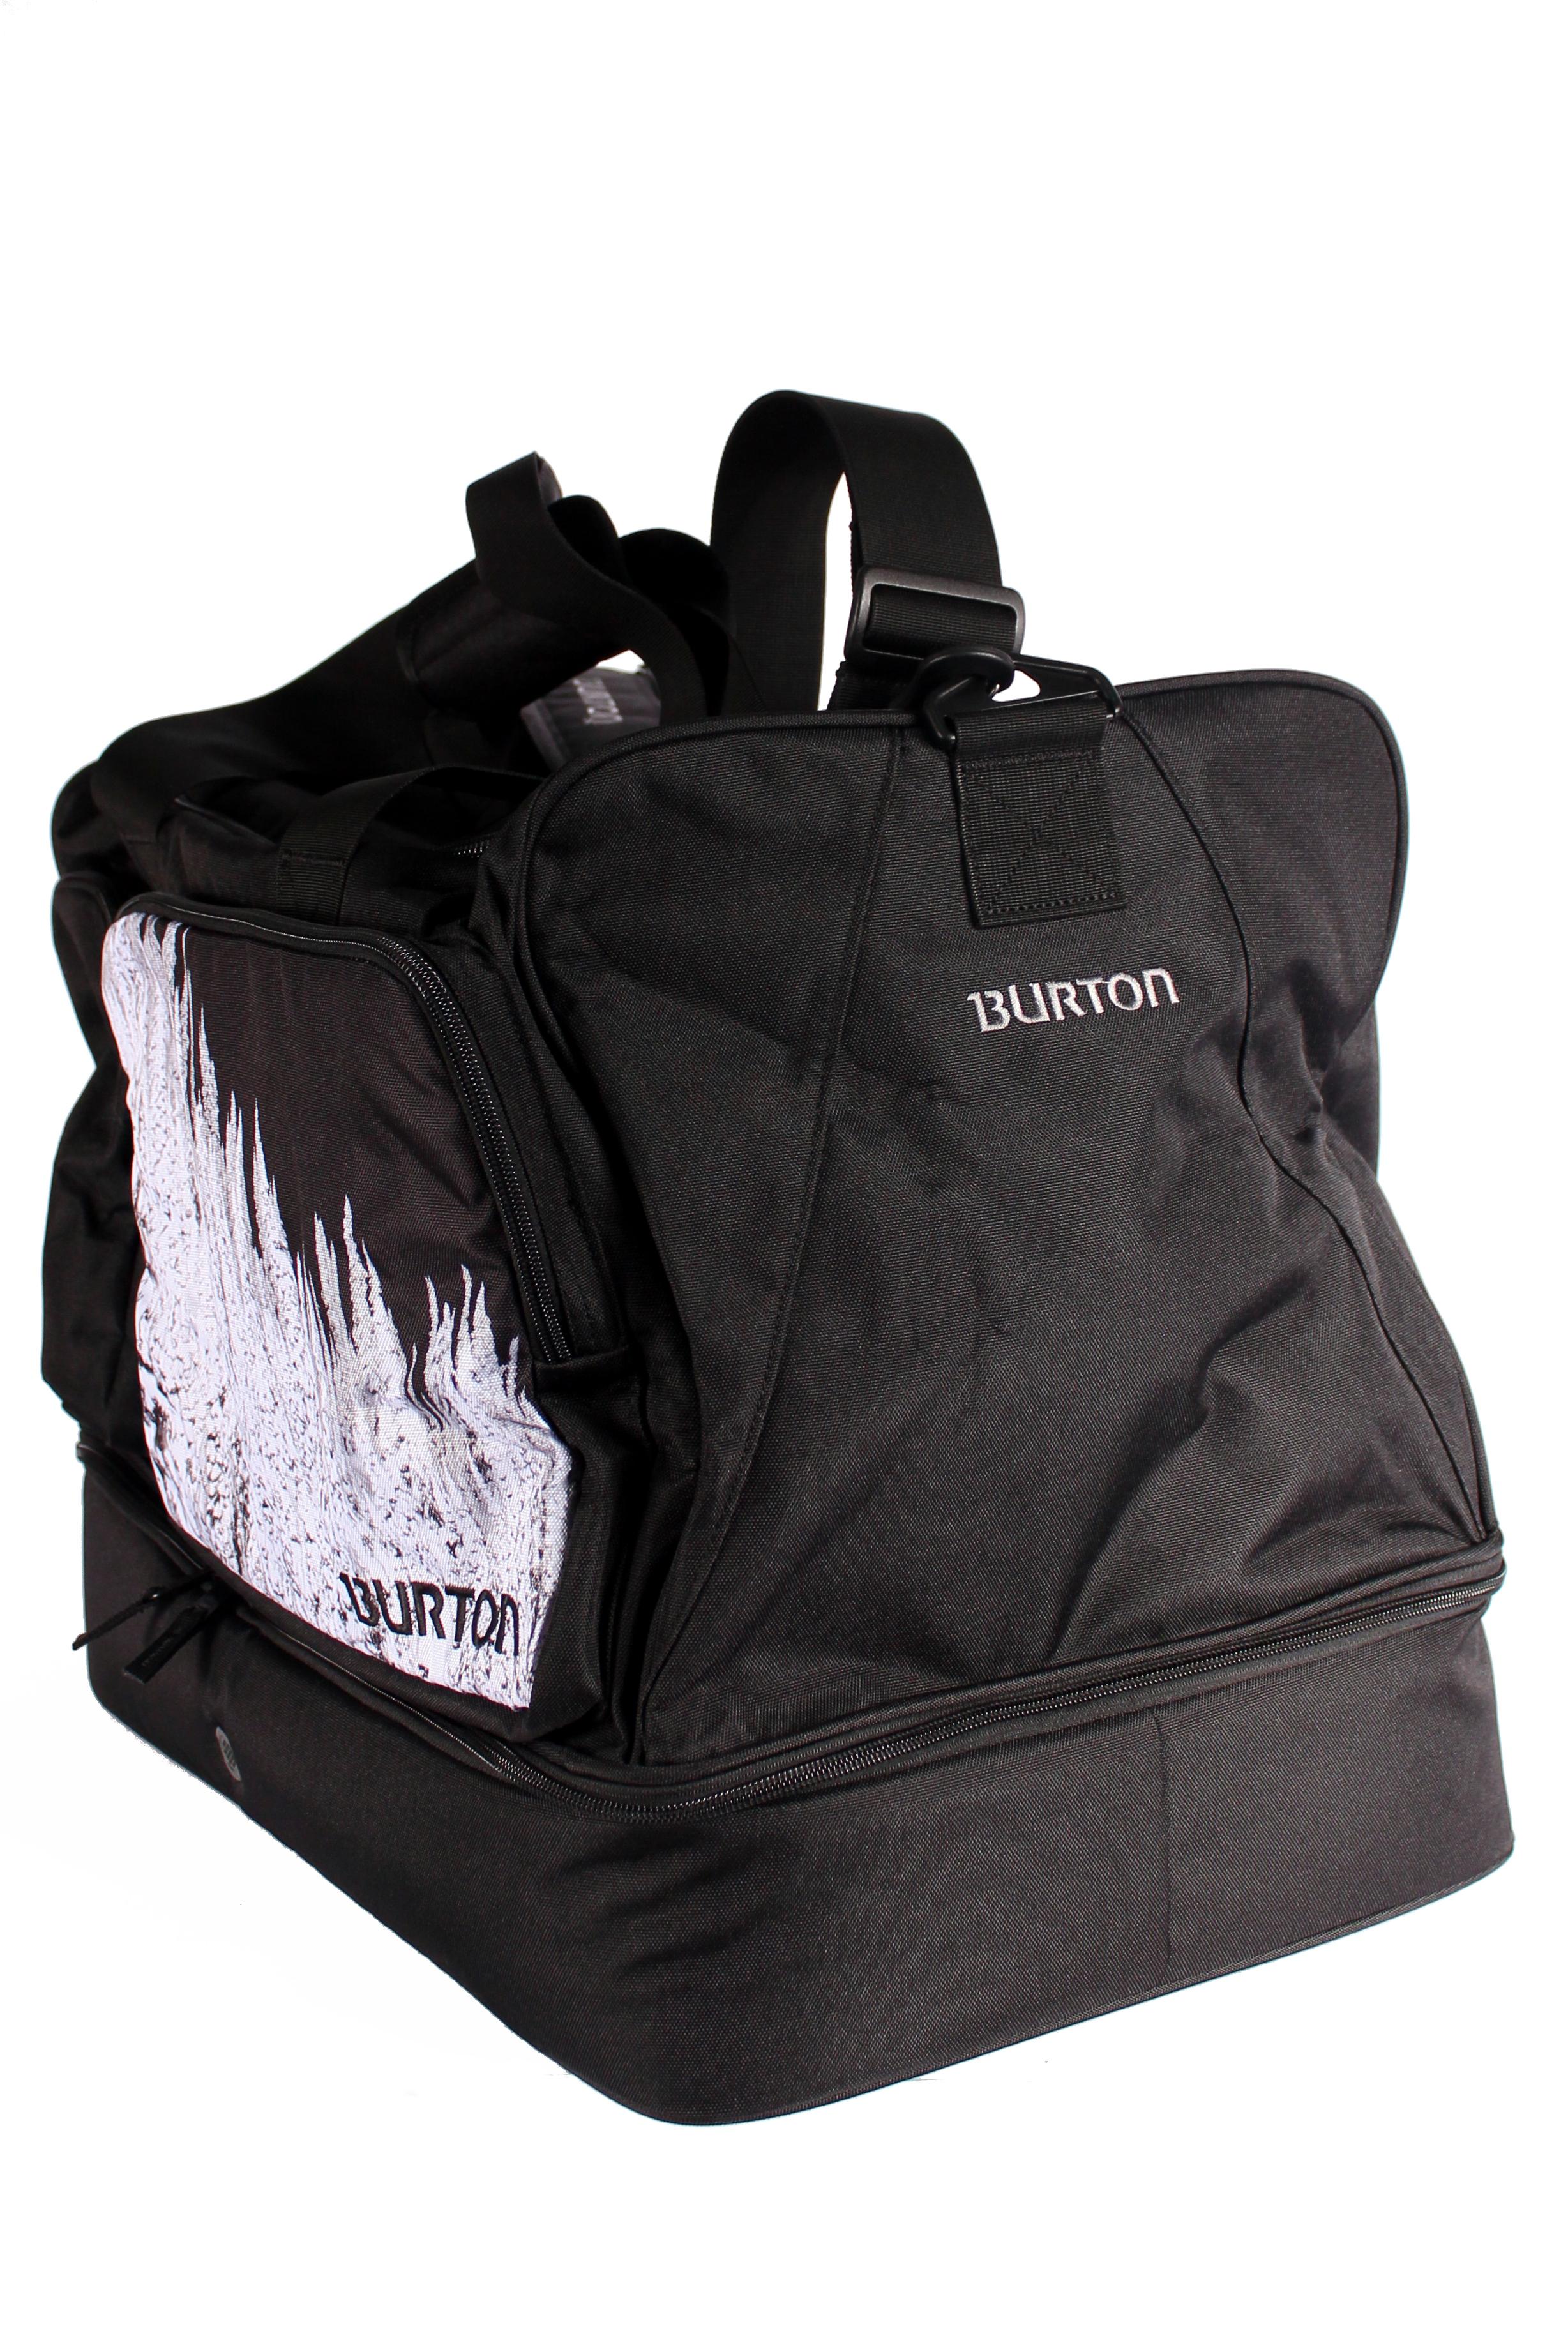 Torba Burton Riders Bag (Revelstoke)